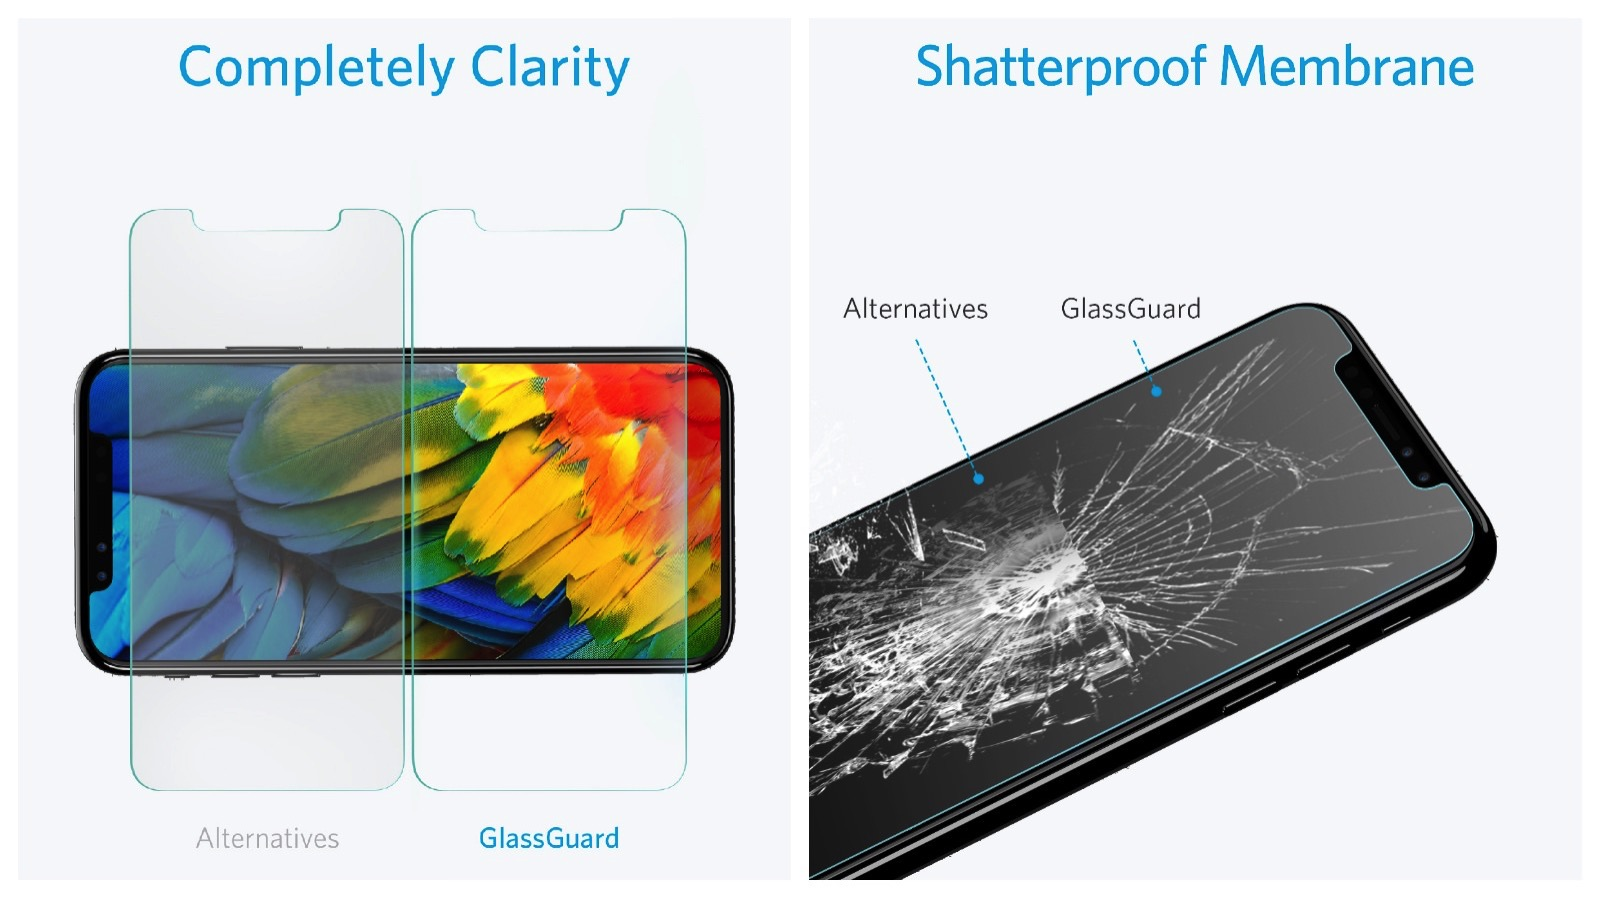 Anker GlassGuard Shatterproof